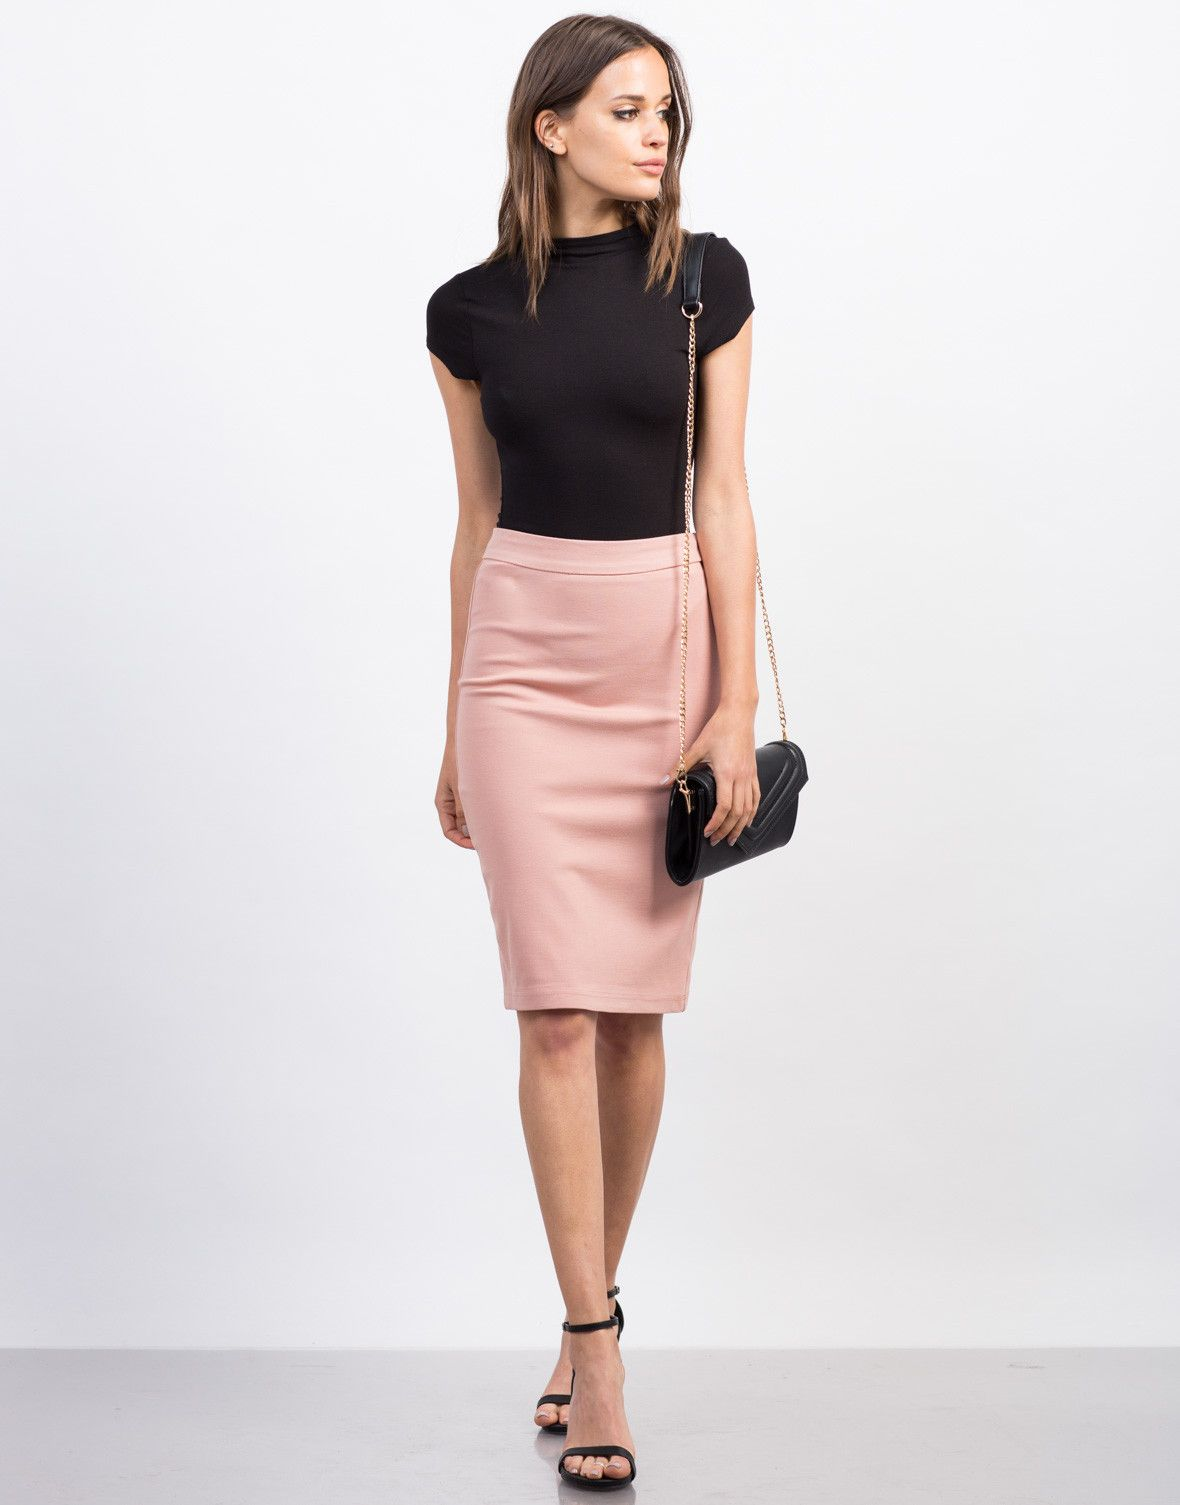 e699a989d Side Zipper Pencil Skirt | Work clothes | Fashion, Outfits, Pencil ...